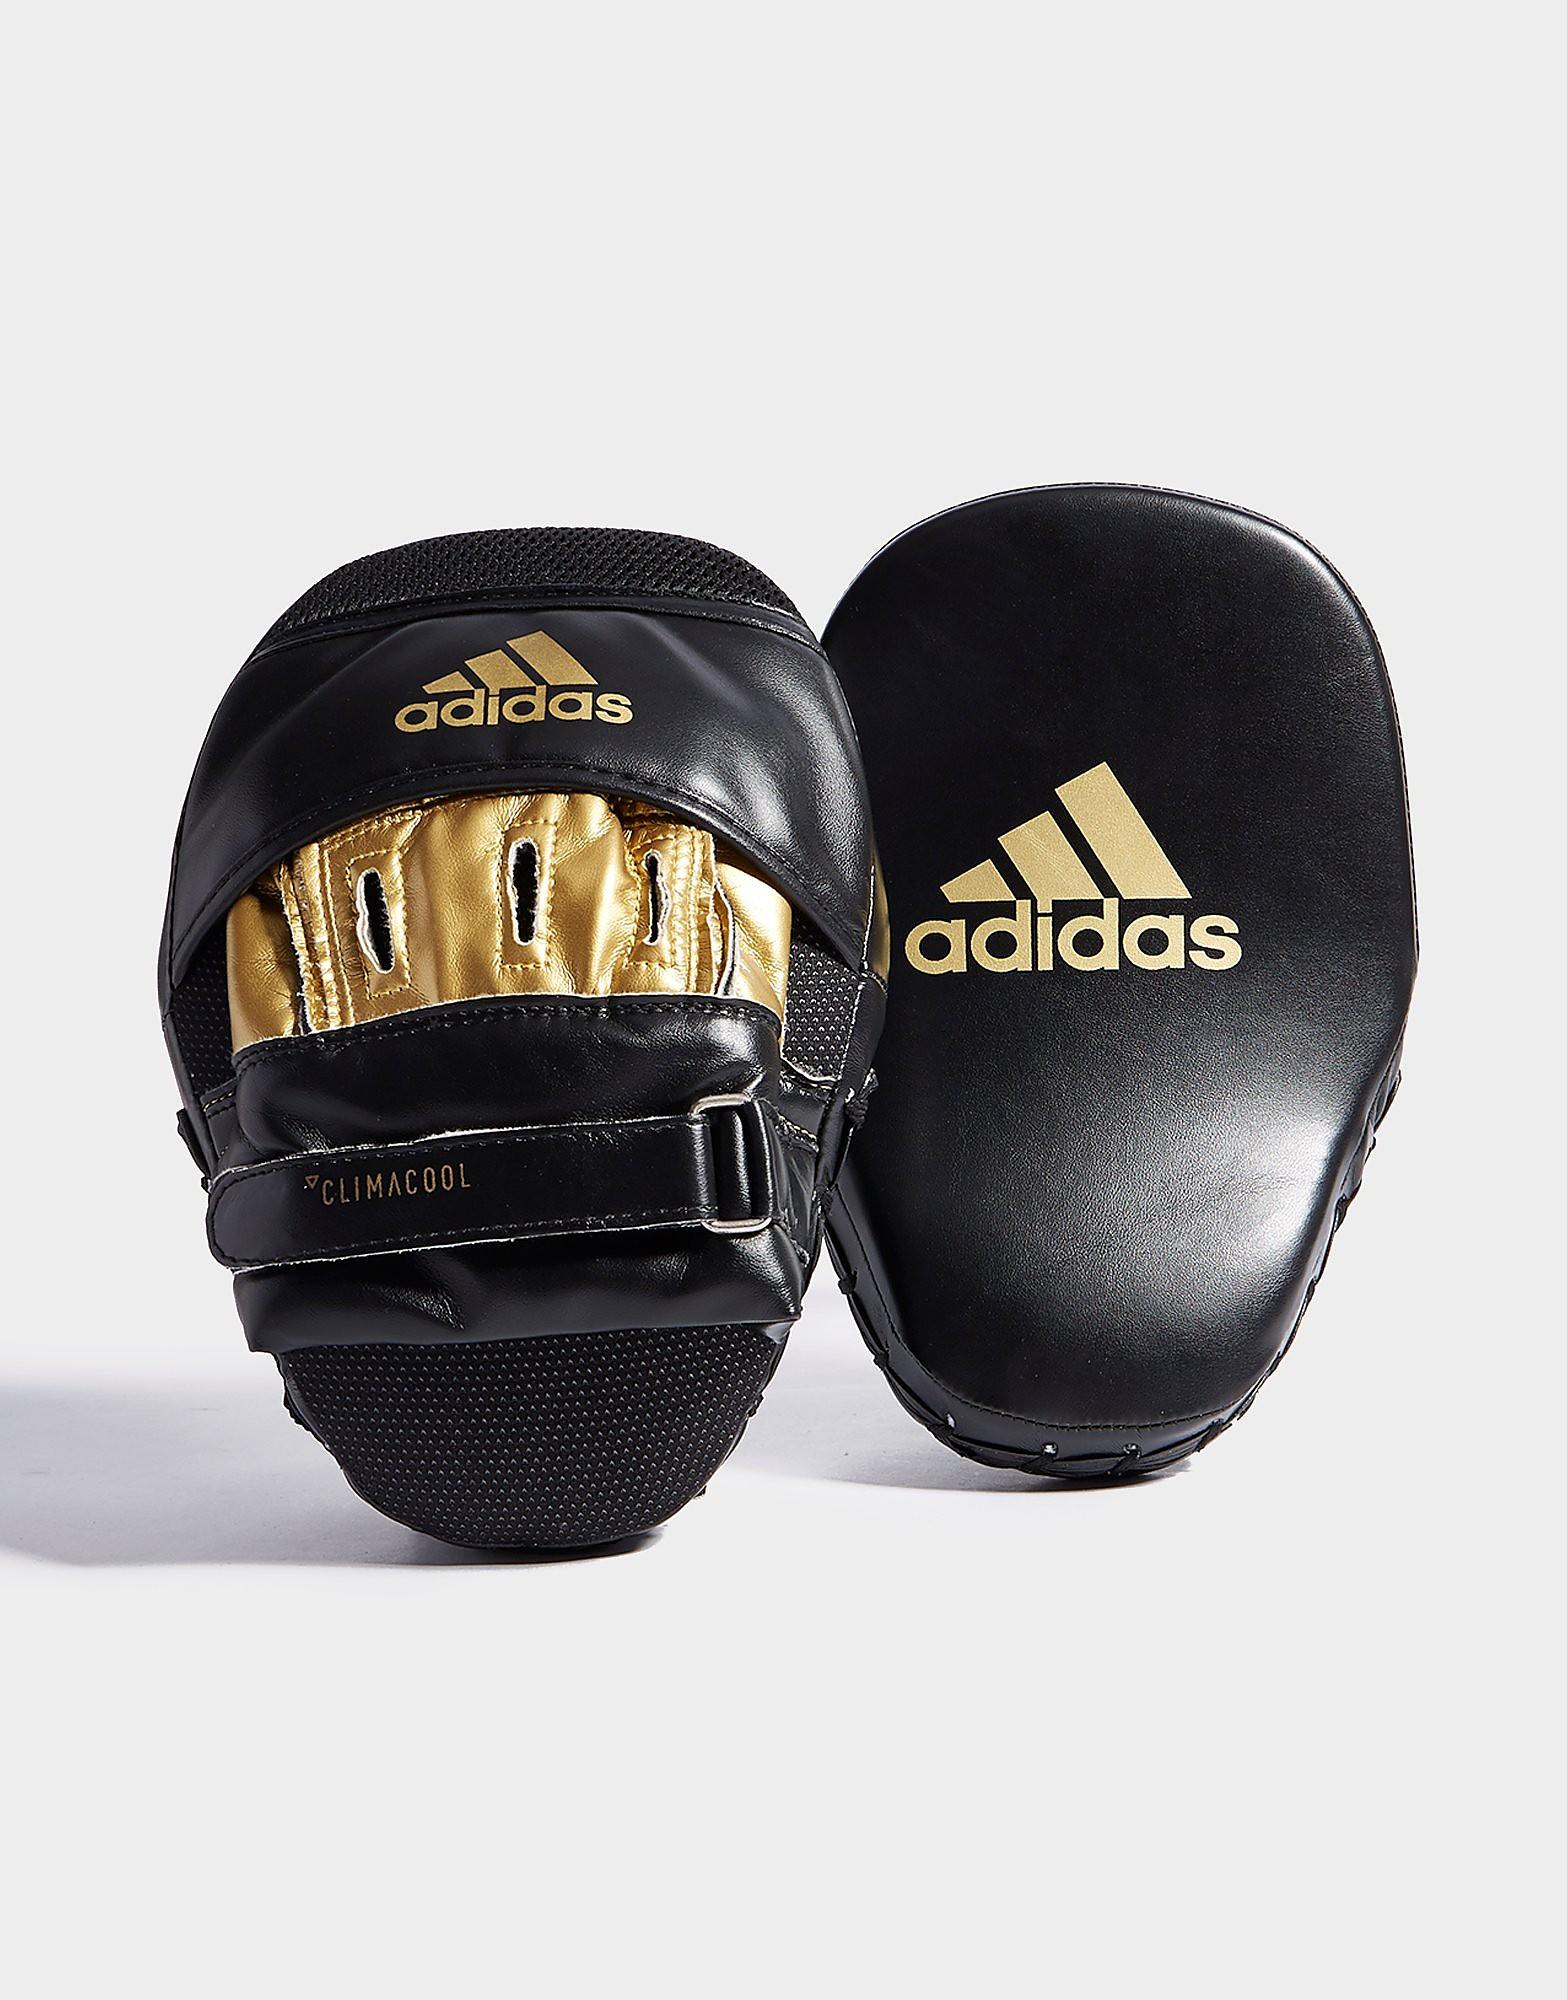 adidas Focus 10 Boxing Mitts